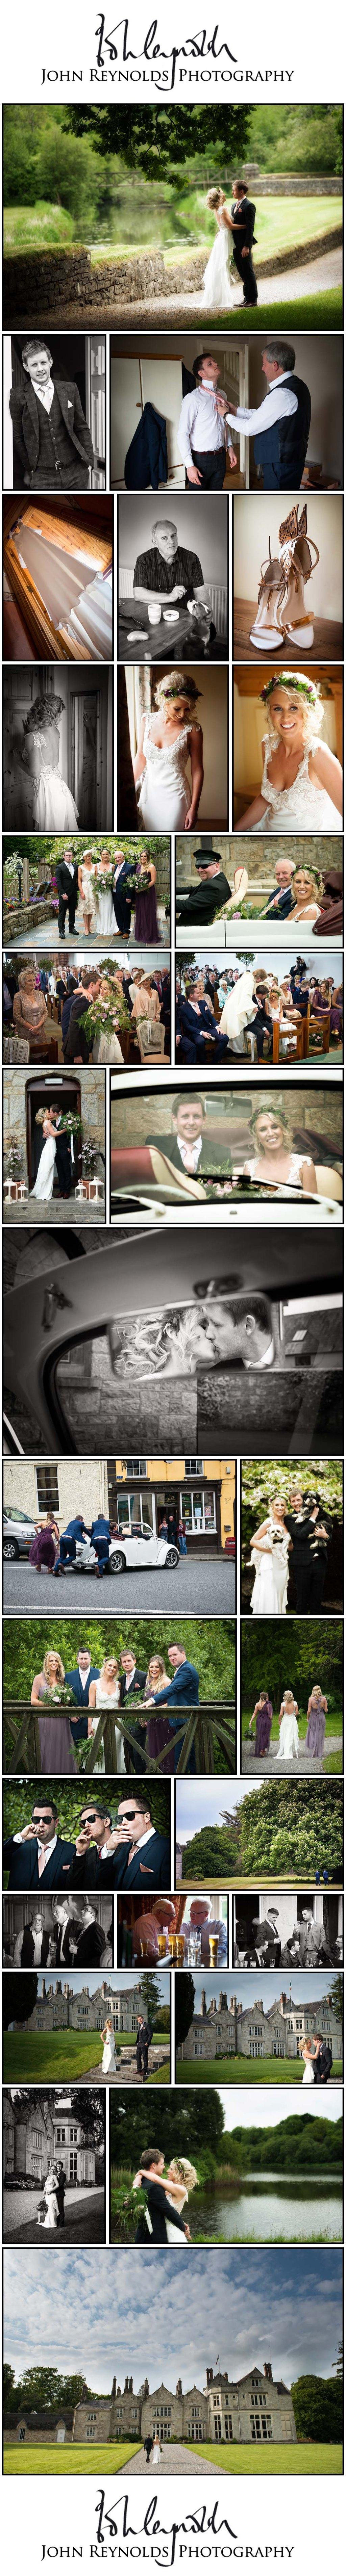 Blog Collage-Jacqui & Eunan